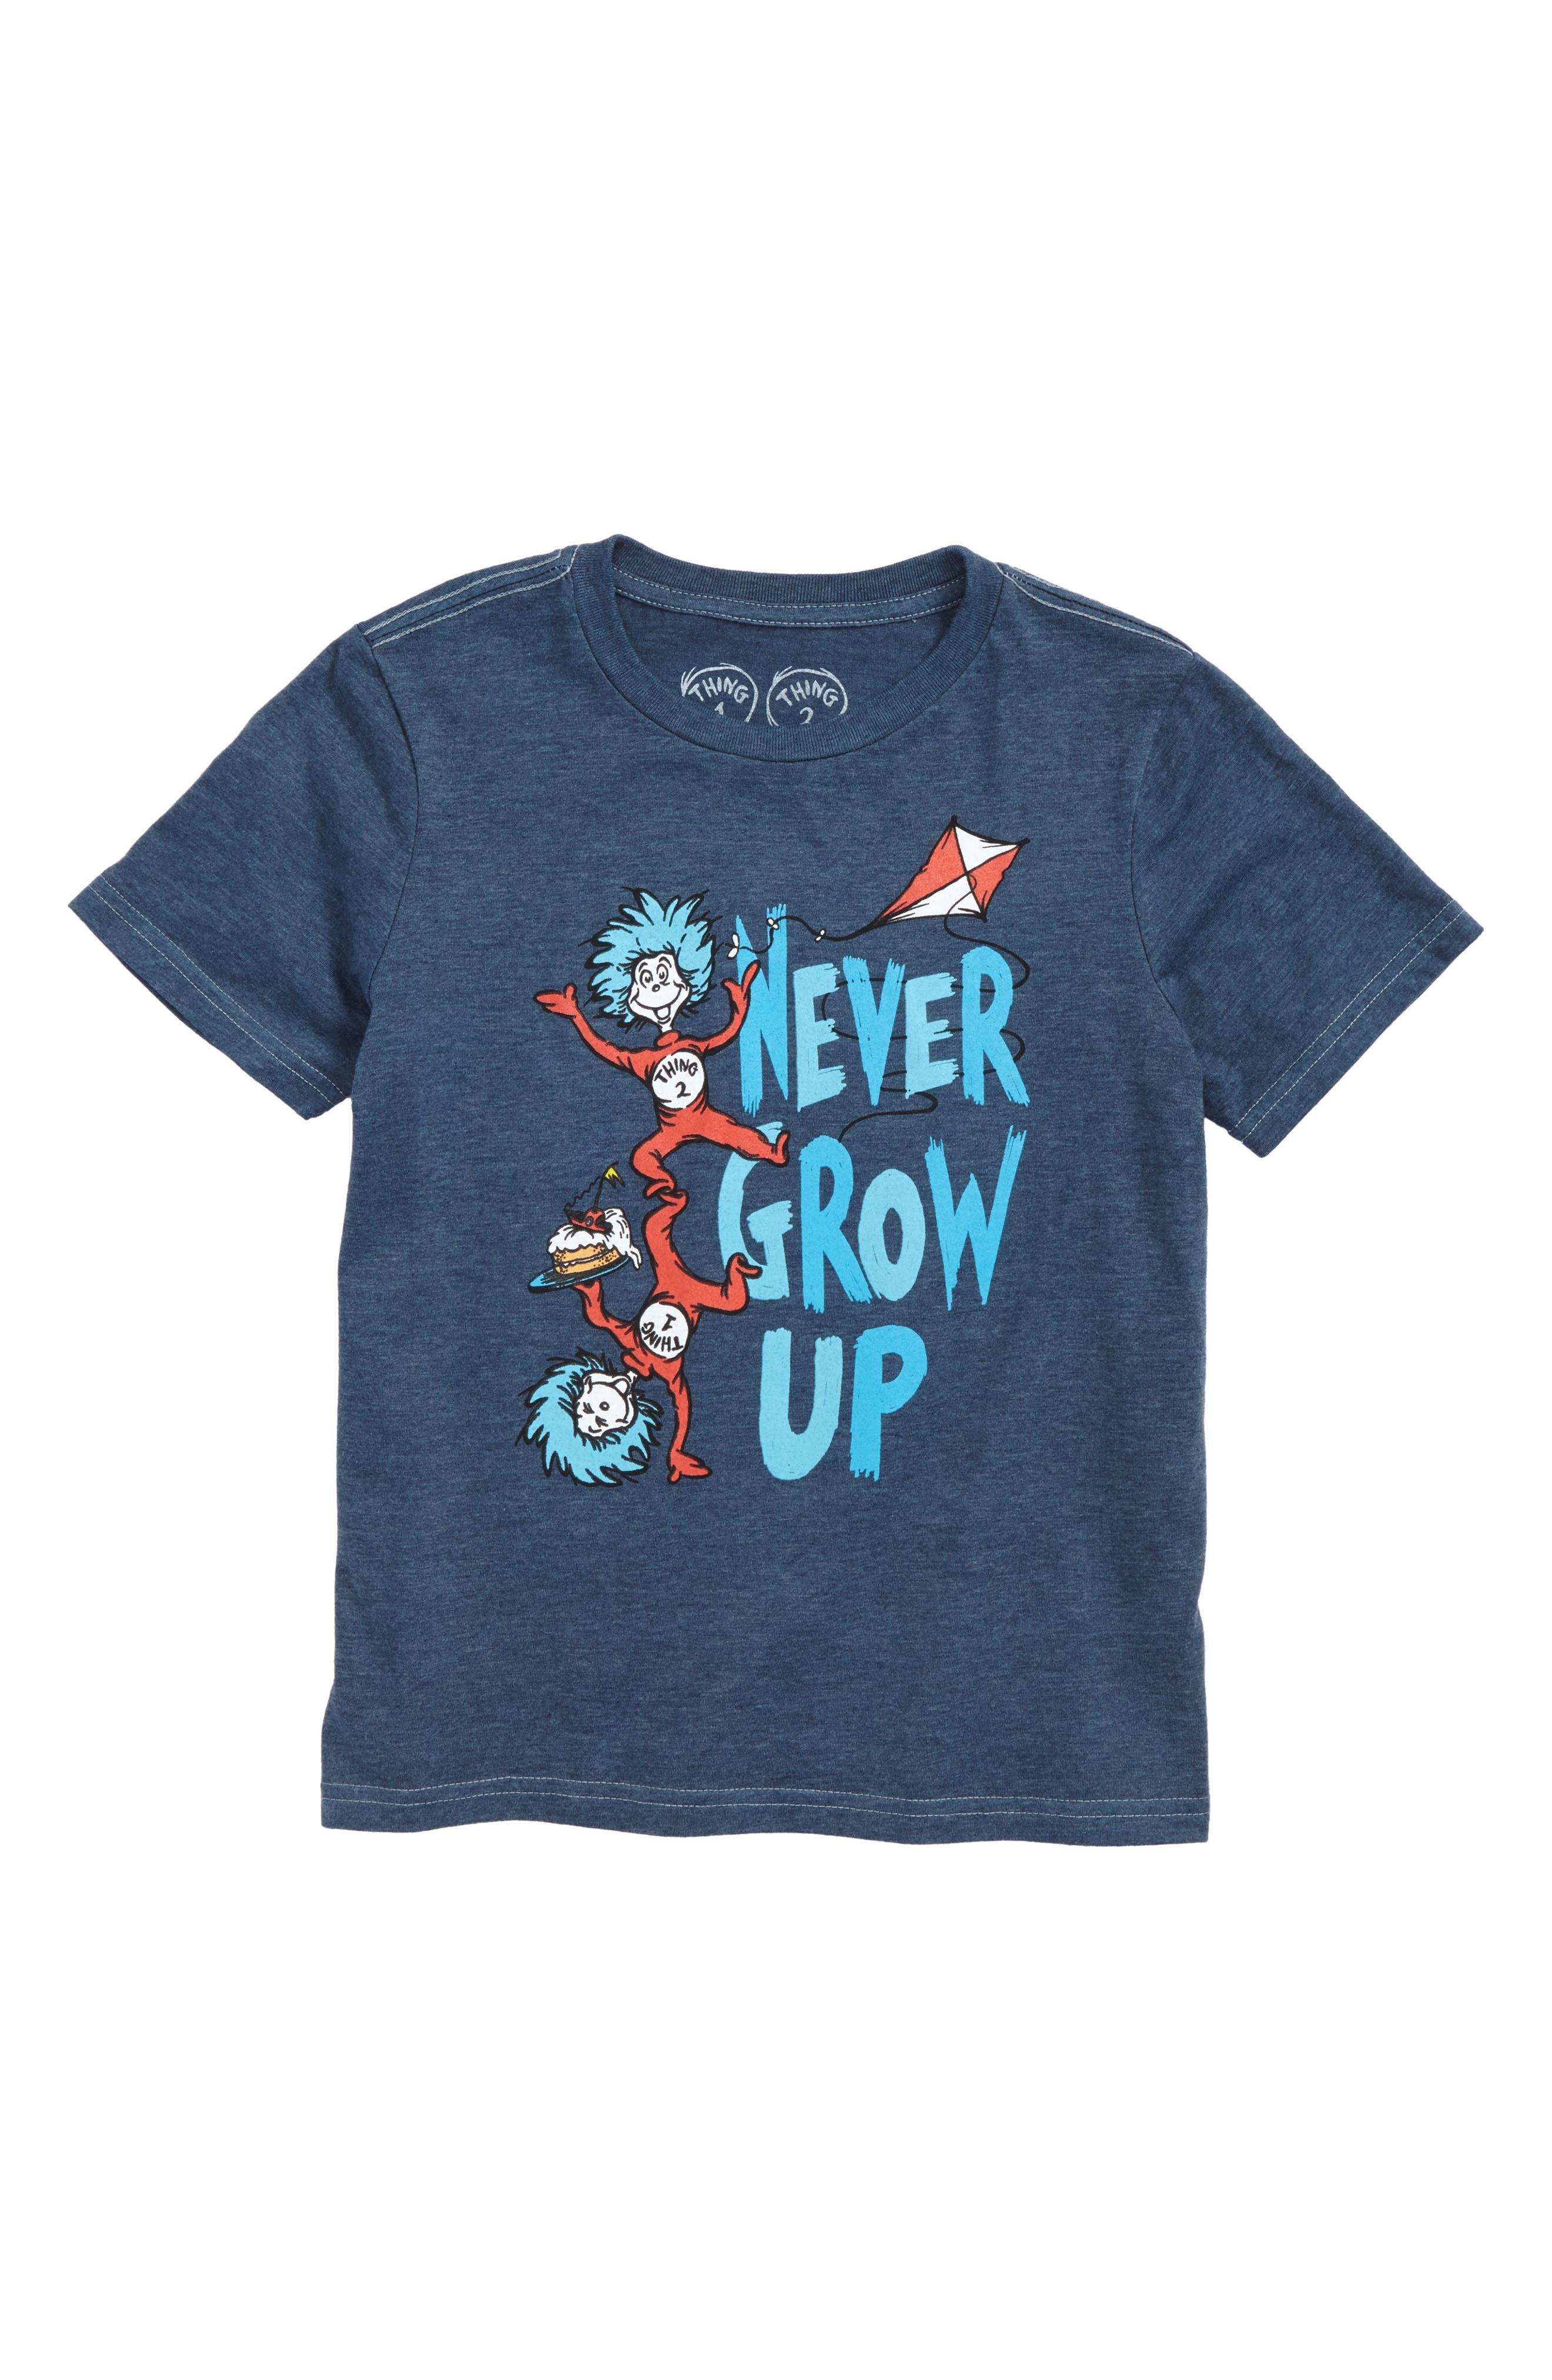 x Dr. Seuss Never Grow Up Graphic T-Shirt,                         Main,                         color, Blue